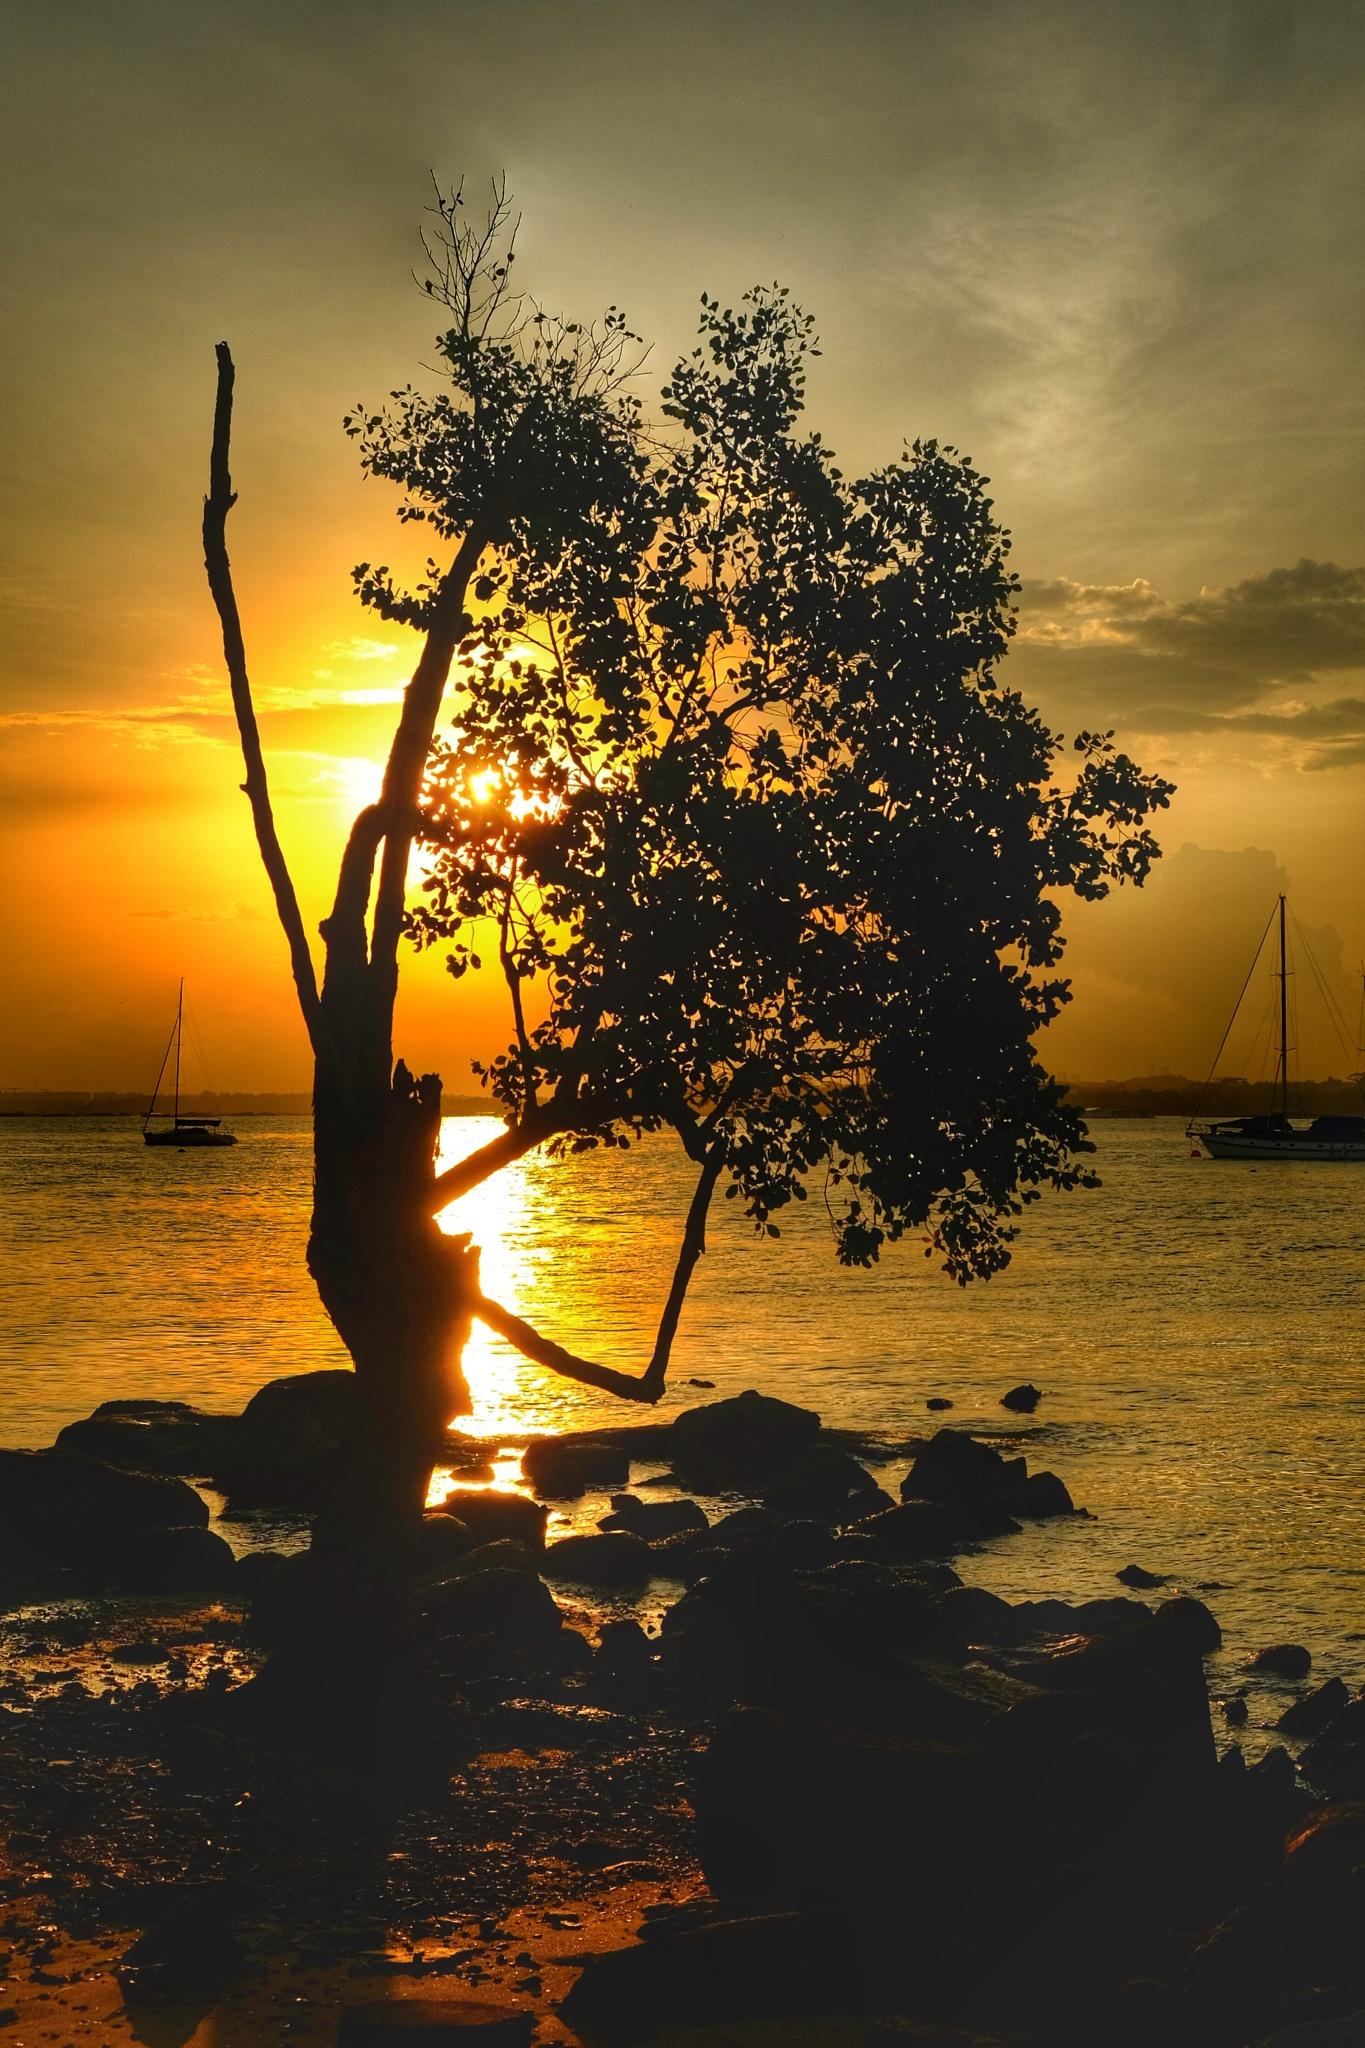 The Tree by Matthew Ng